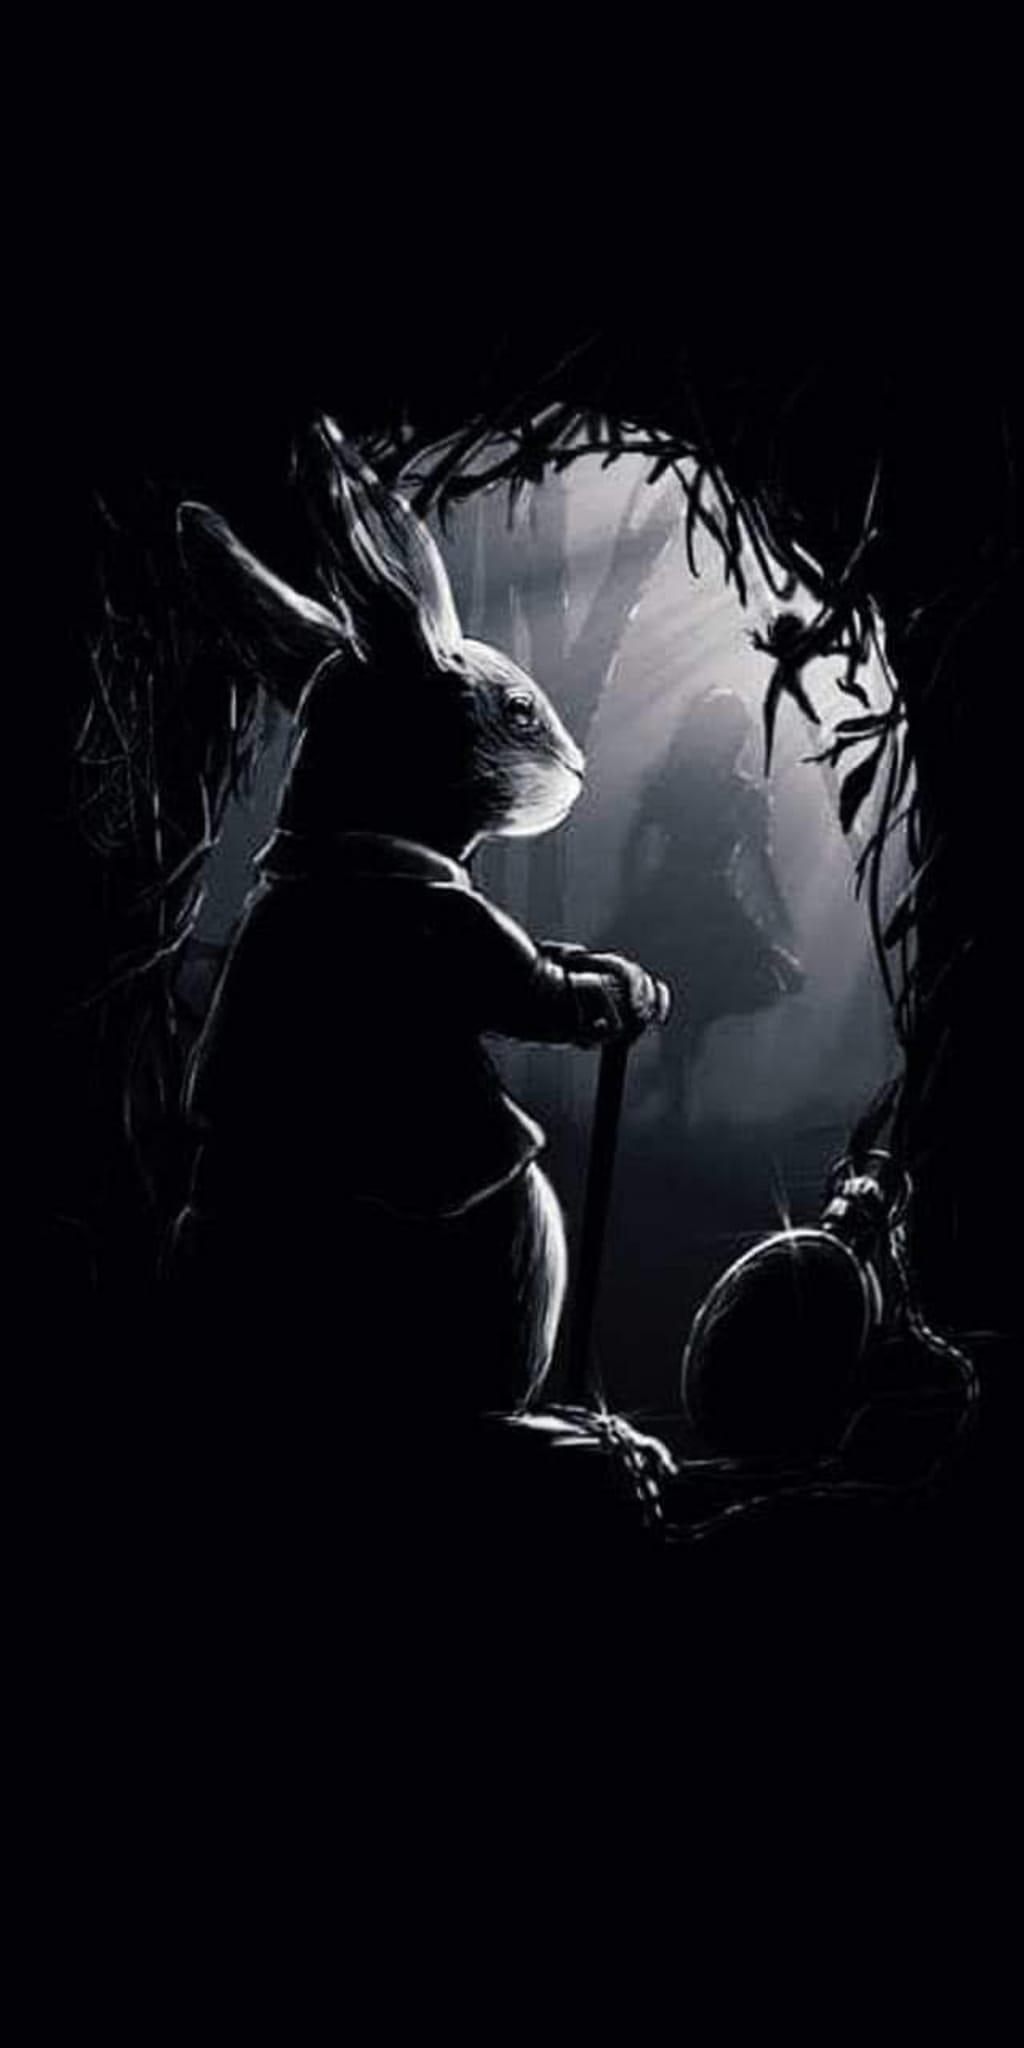 Nighttime hope.